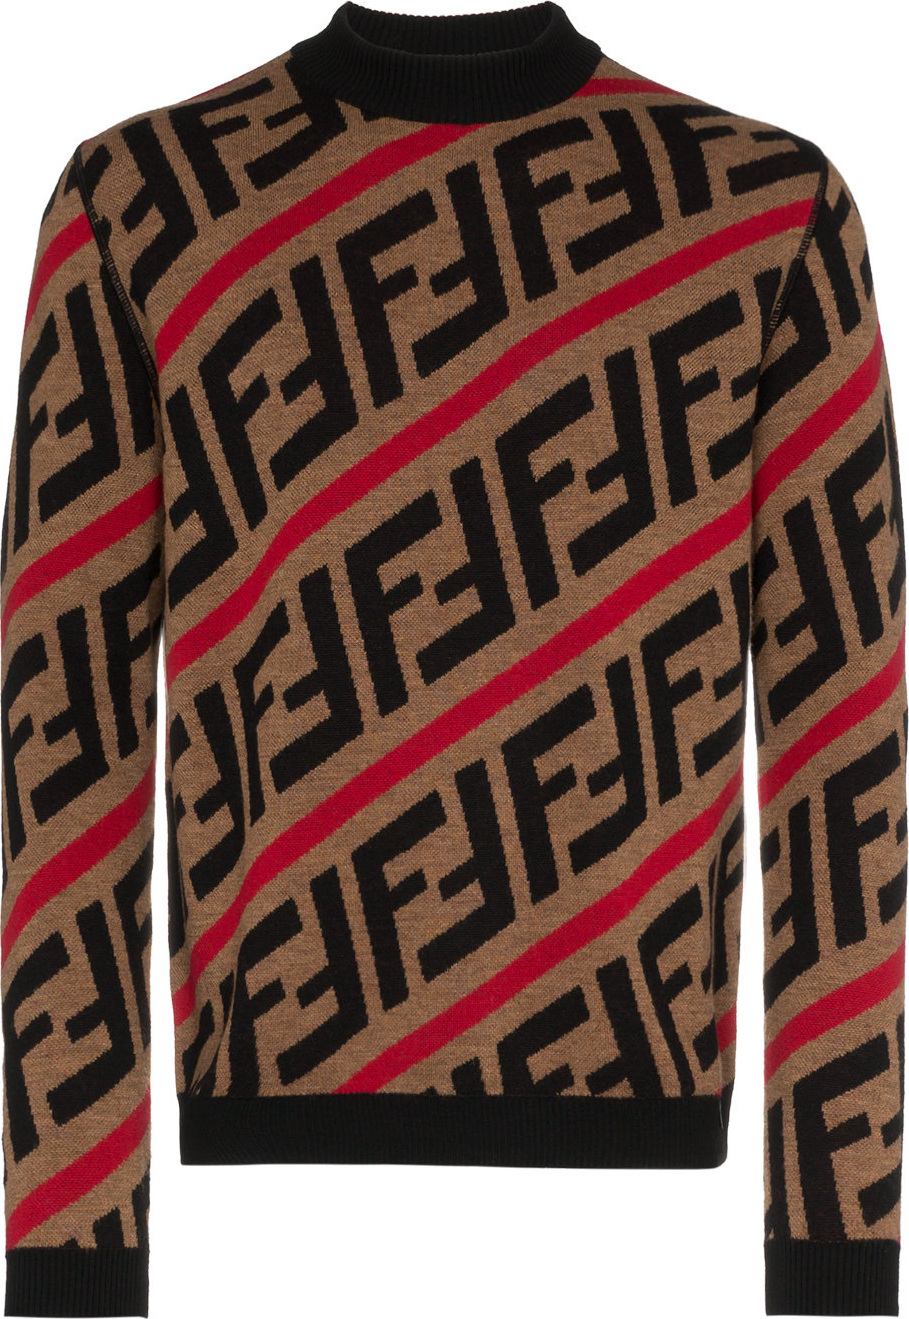 7648b0ac Fendi Logo intarsia knitted wool jumper - Mkt